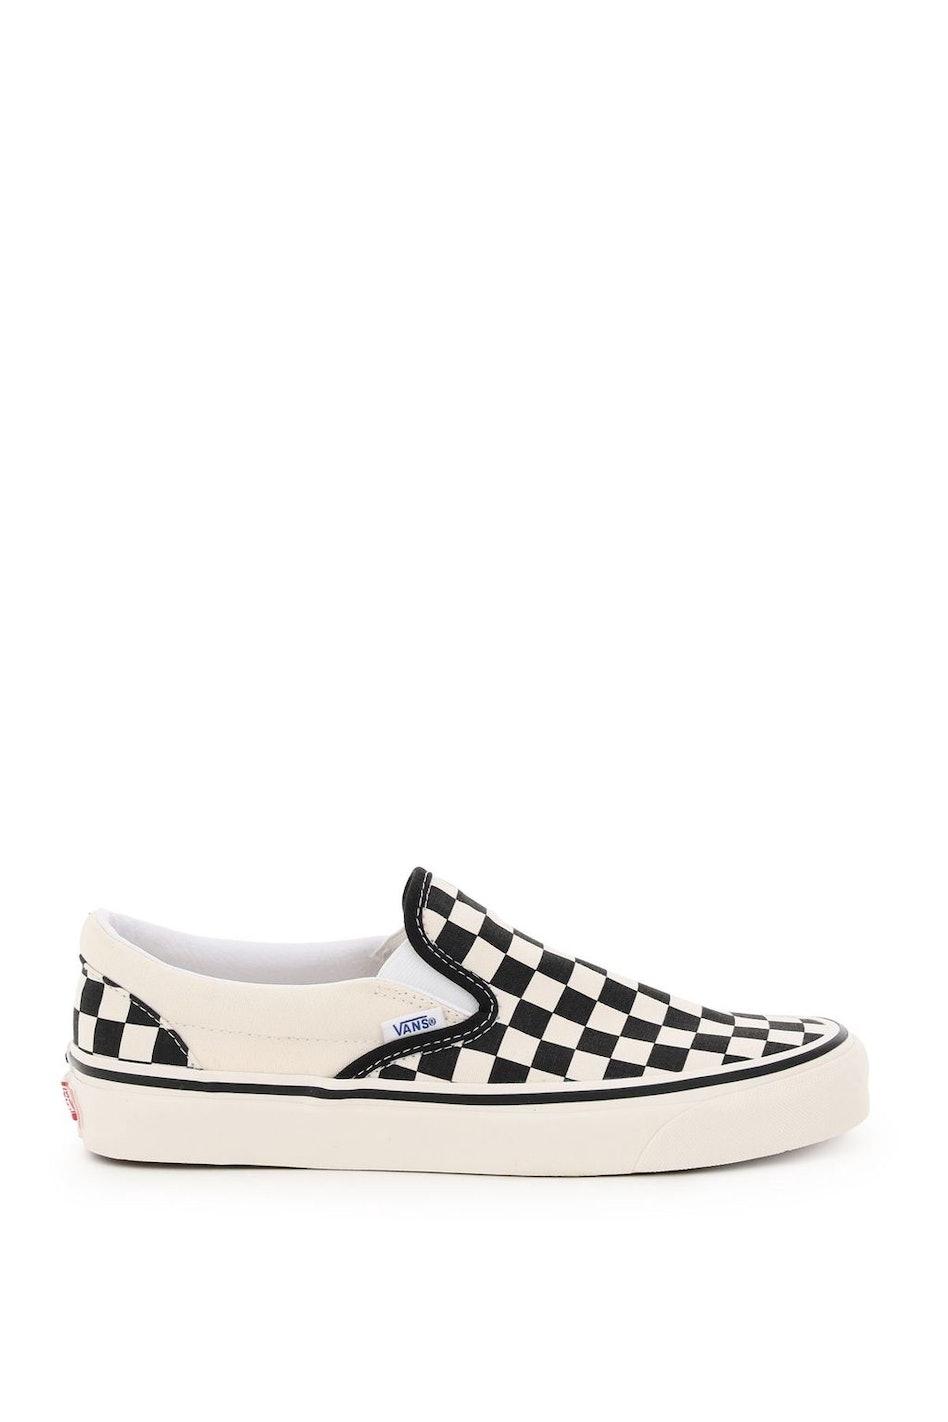 Vans Classic Slip-on Checkerboard Sneakers: image 1